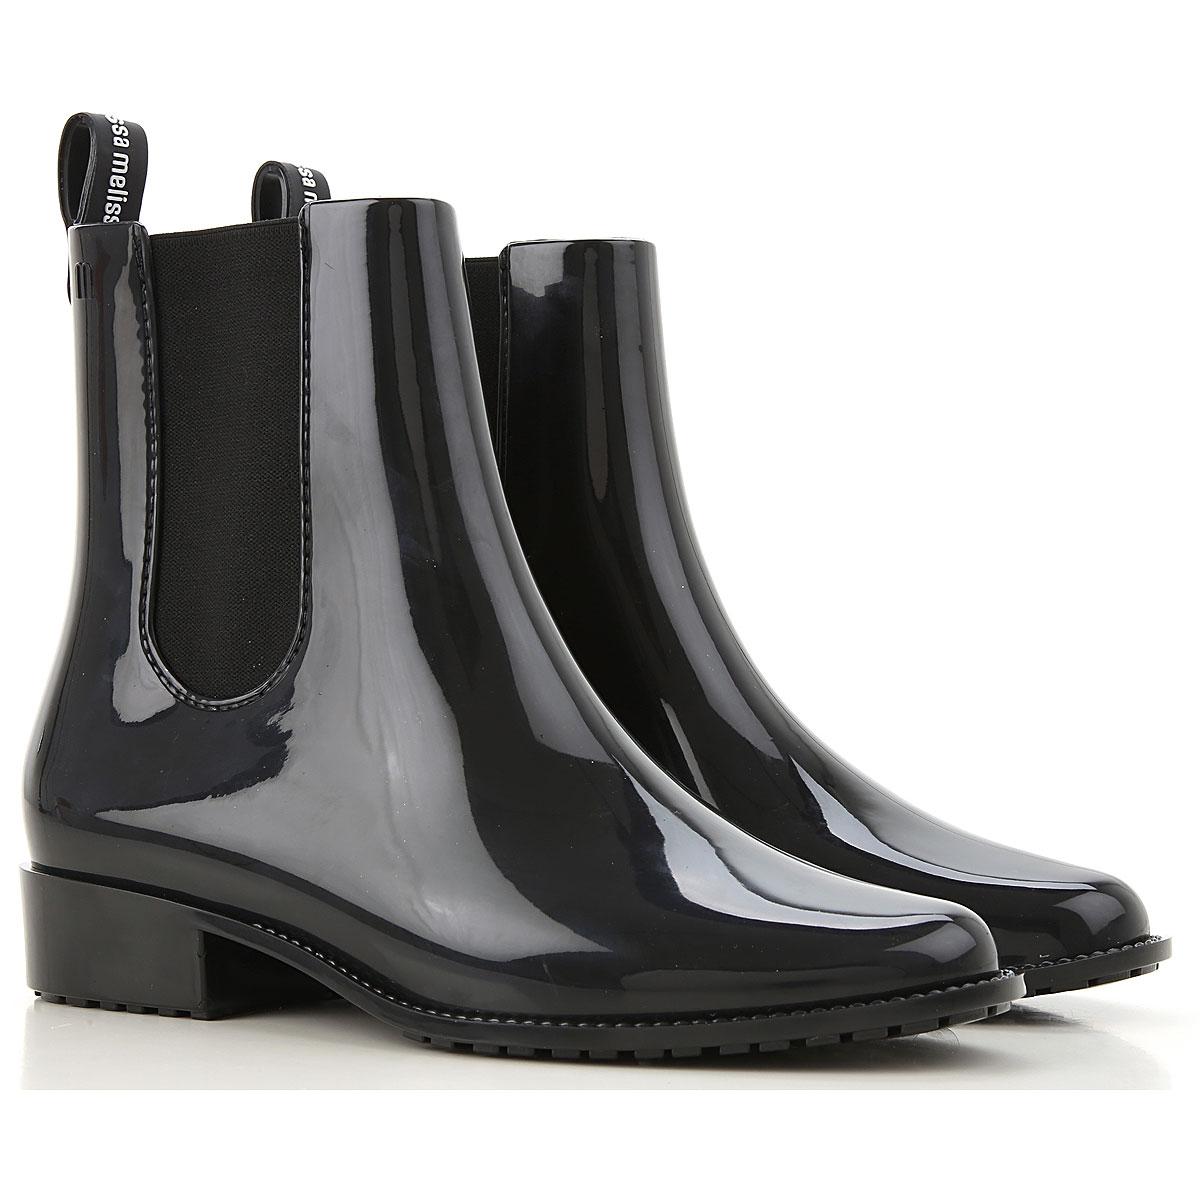 Melissa Boots for Women, Booties On Sale, Black, PVC, 2019, USA 8 - EUR 39 USA 9 - EUR 40 USA 10 - EUR 41/42